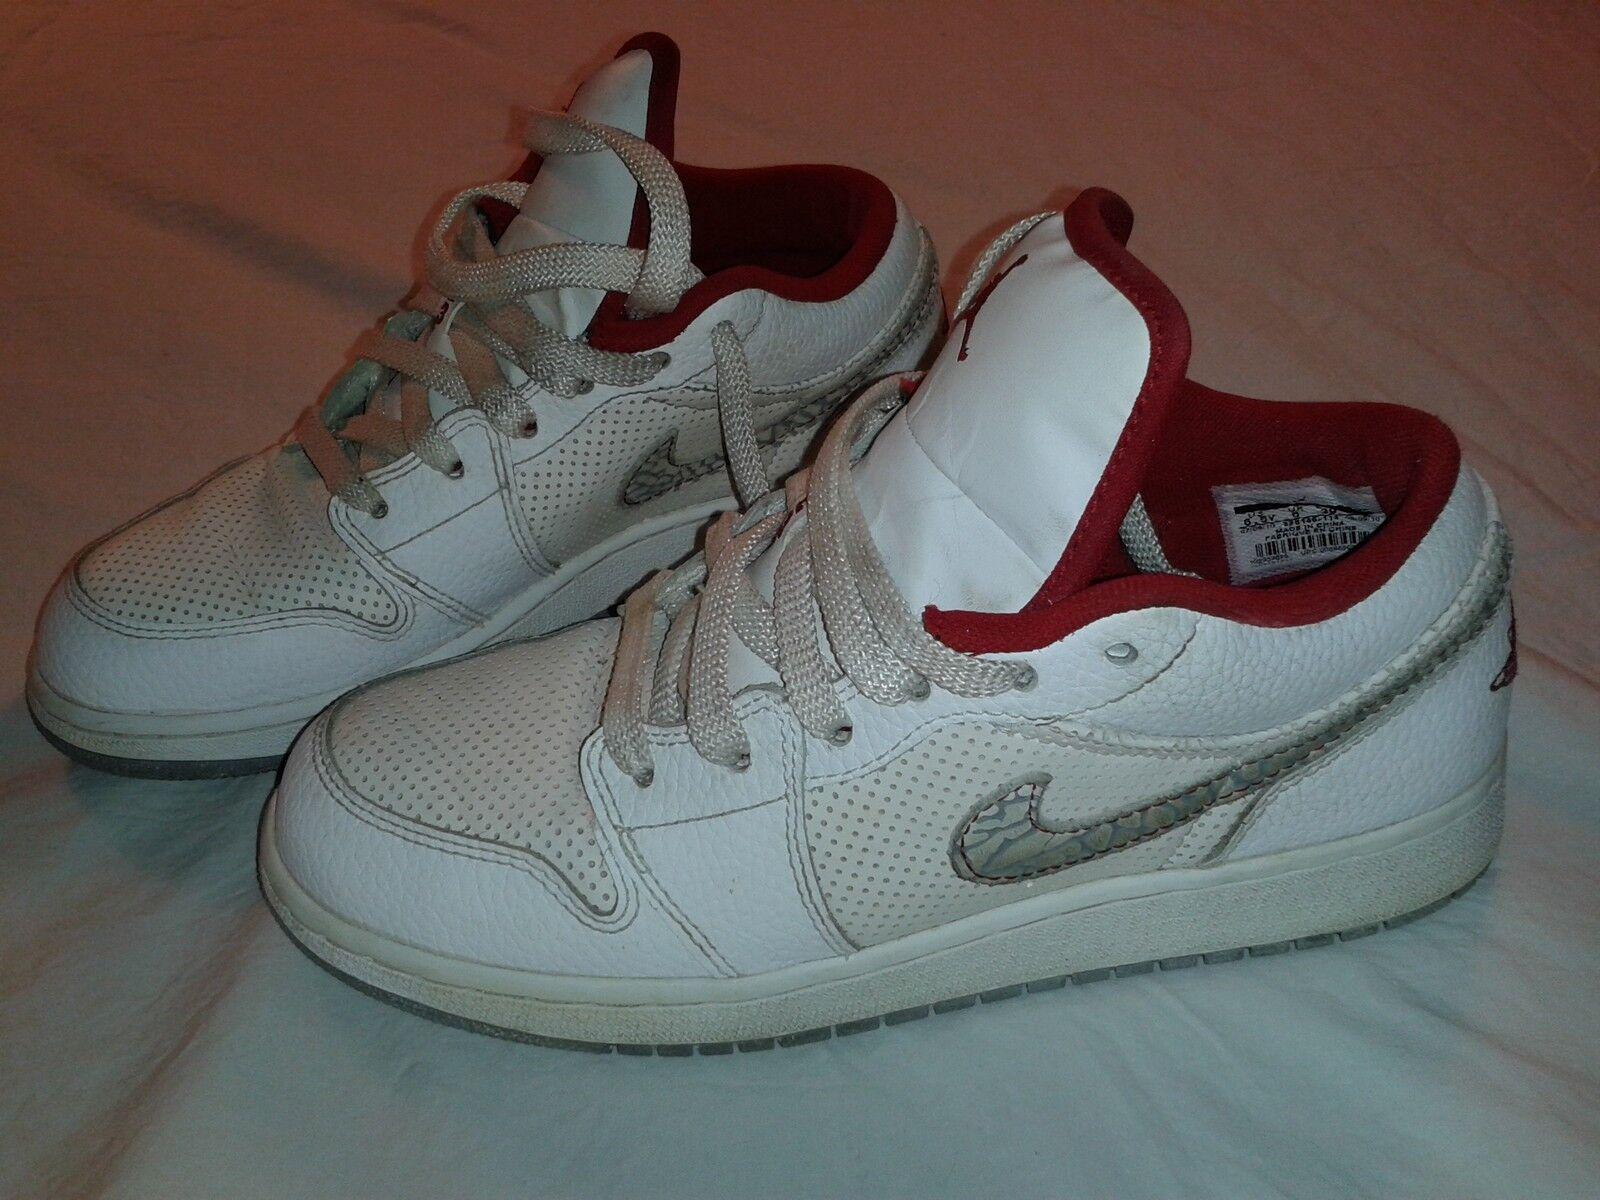 Nike Air Jordan 1 Phat Low Youth 6.5 Y White Red Cement